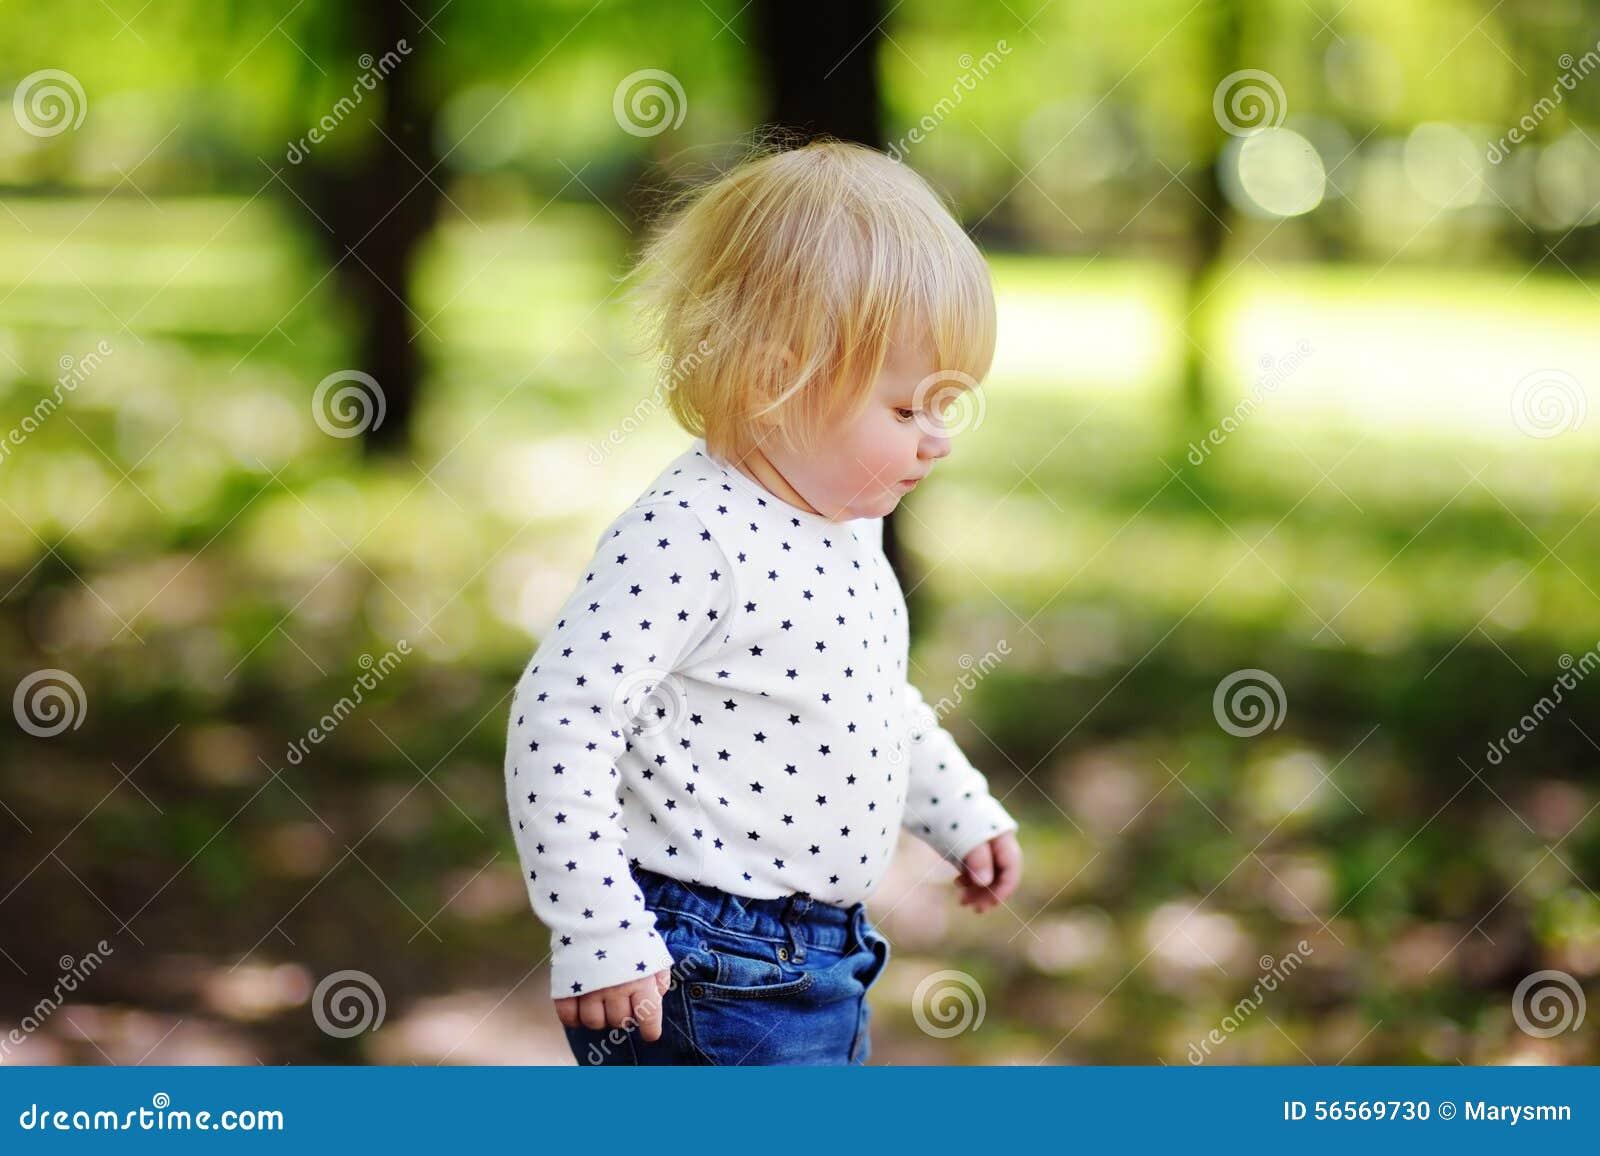 Download Πορτρέτο του παιδιού μικρών παιδιών Στοκ Εικόνες - εικόνα από ανάπτυξη, πόλη: 56569730